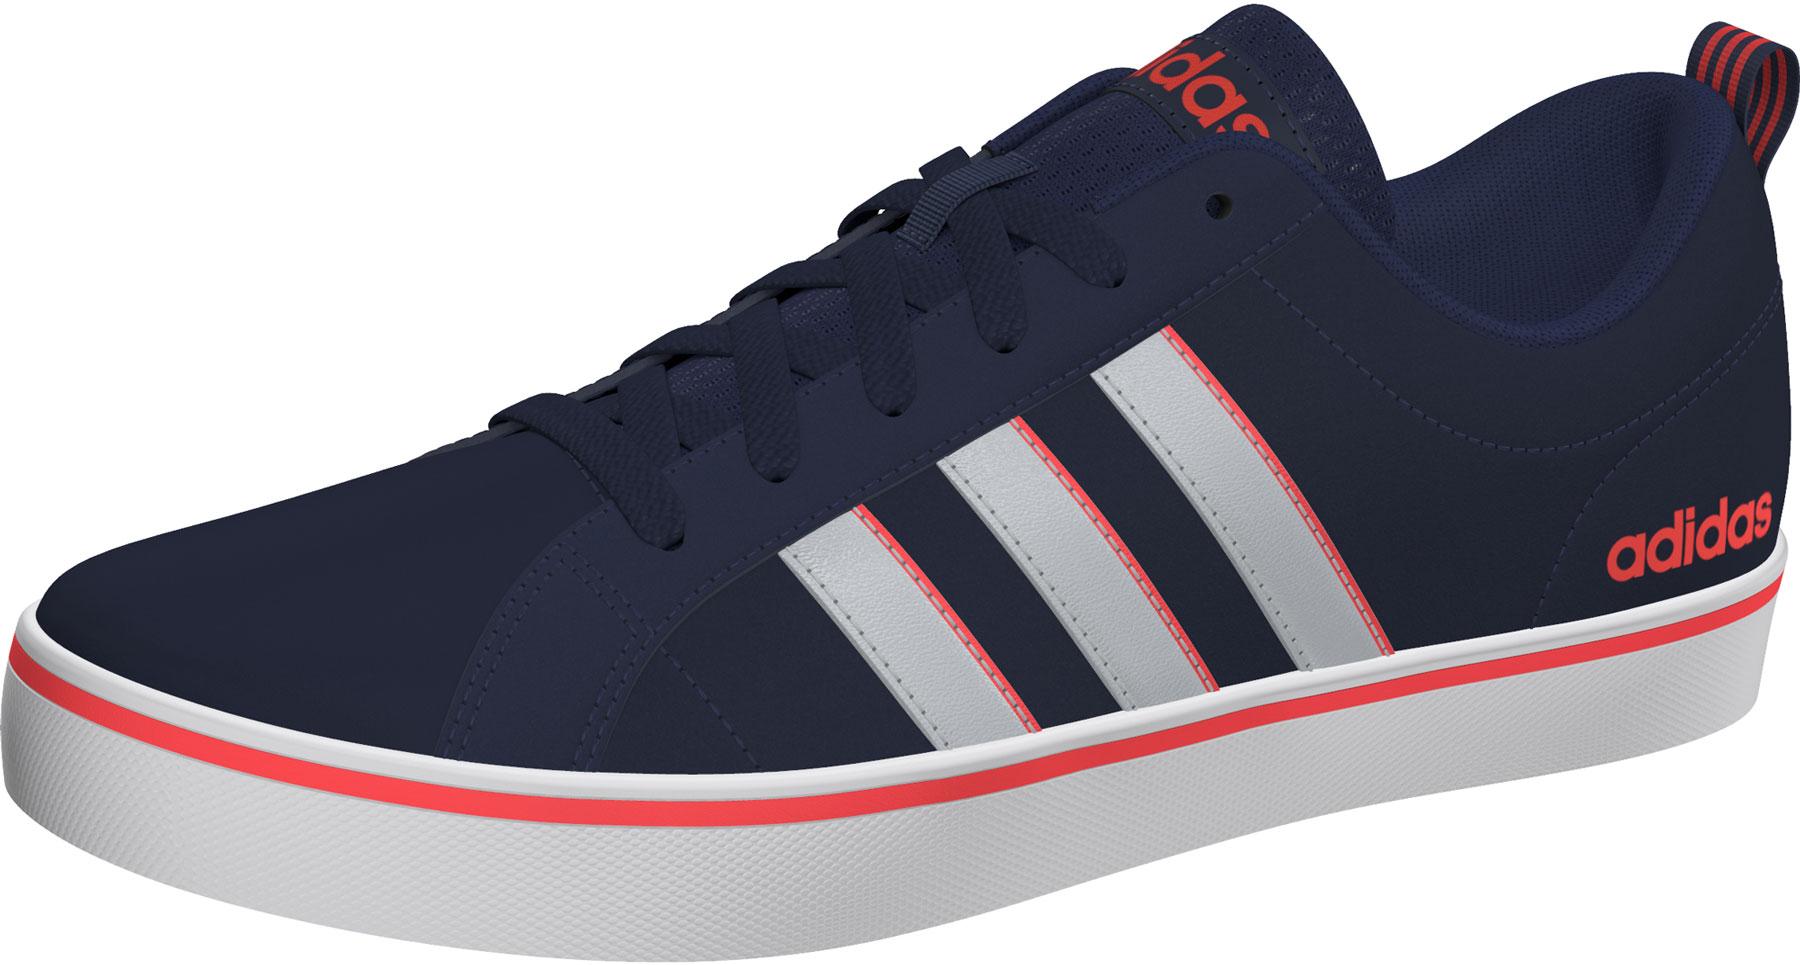 b19b0f1873d3 Pánska lifestylová obuv